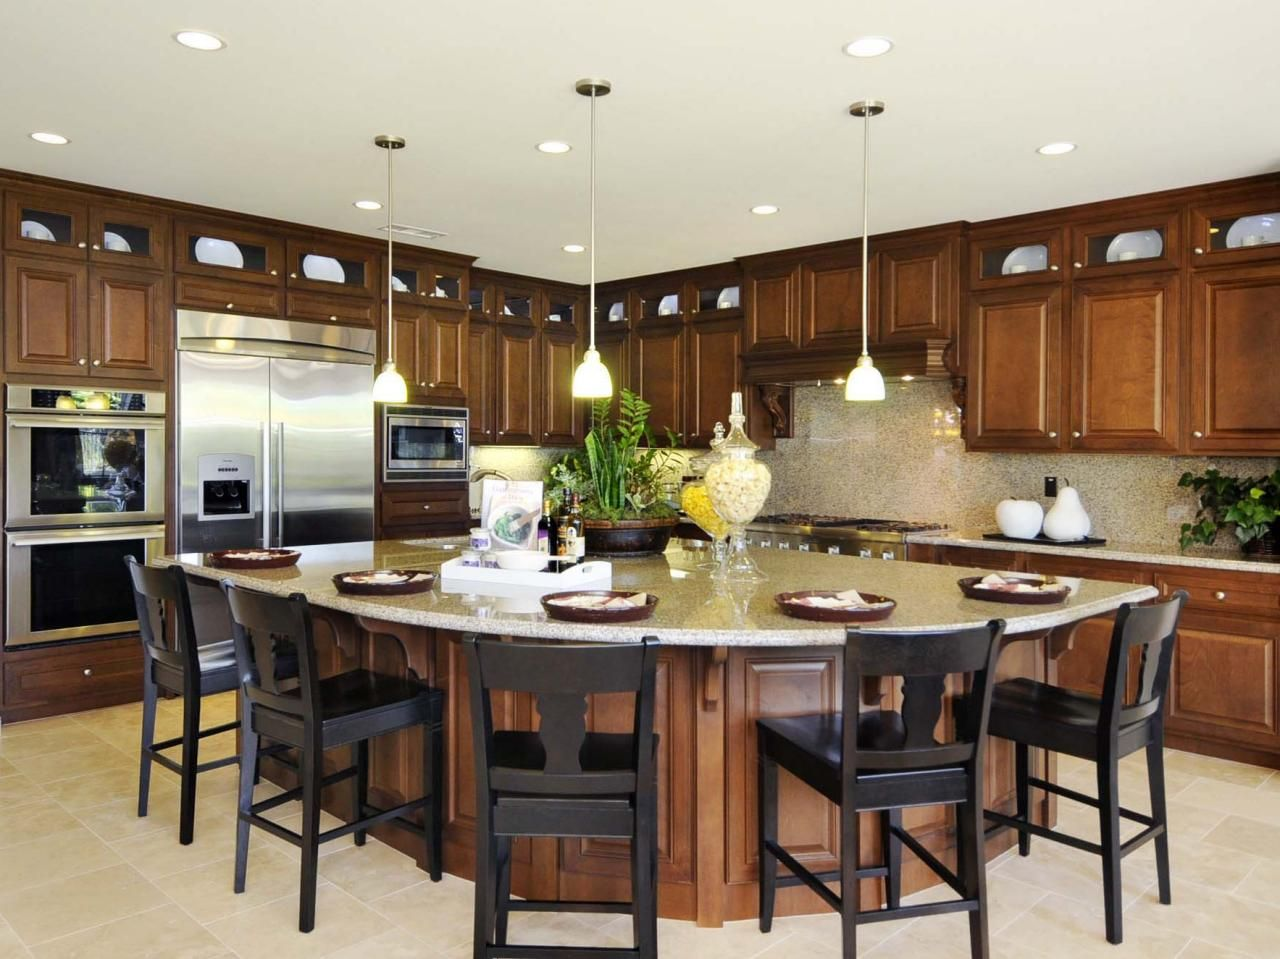 Kitchen Island Design Ideas Pictures Options & Tips Kitchen